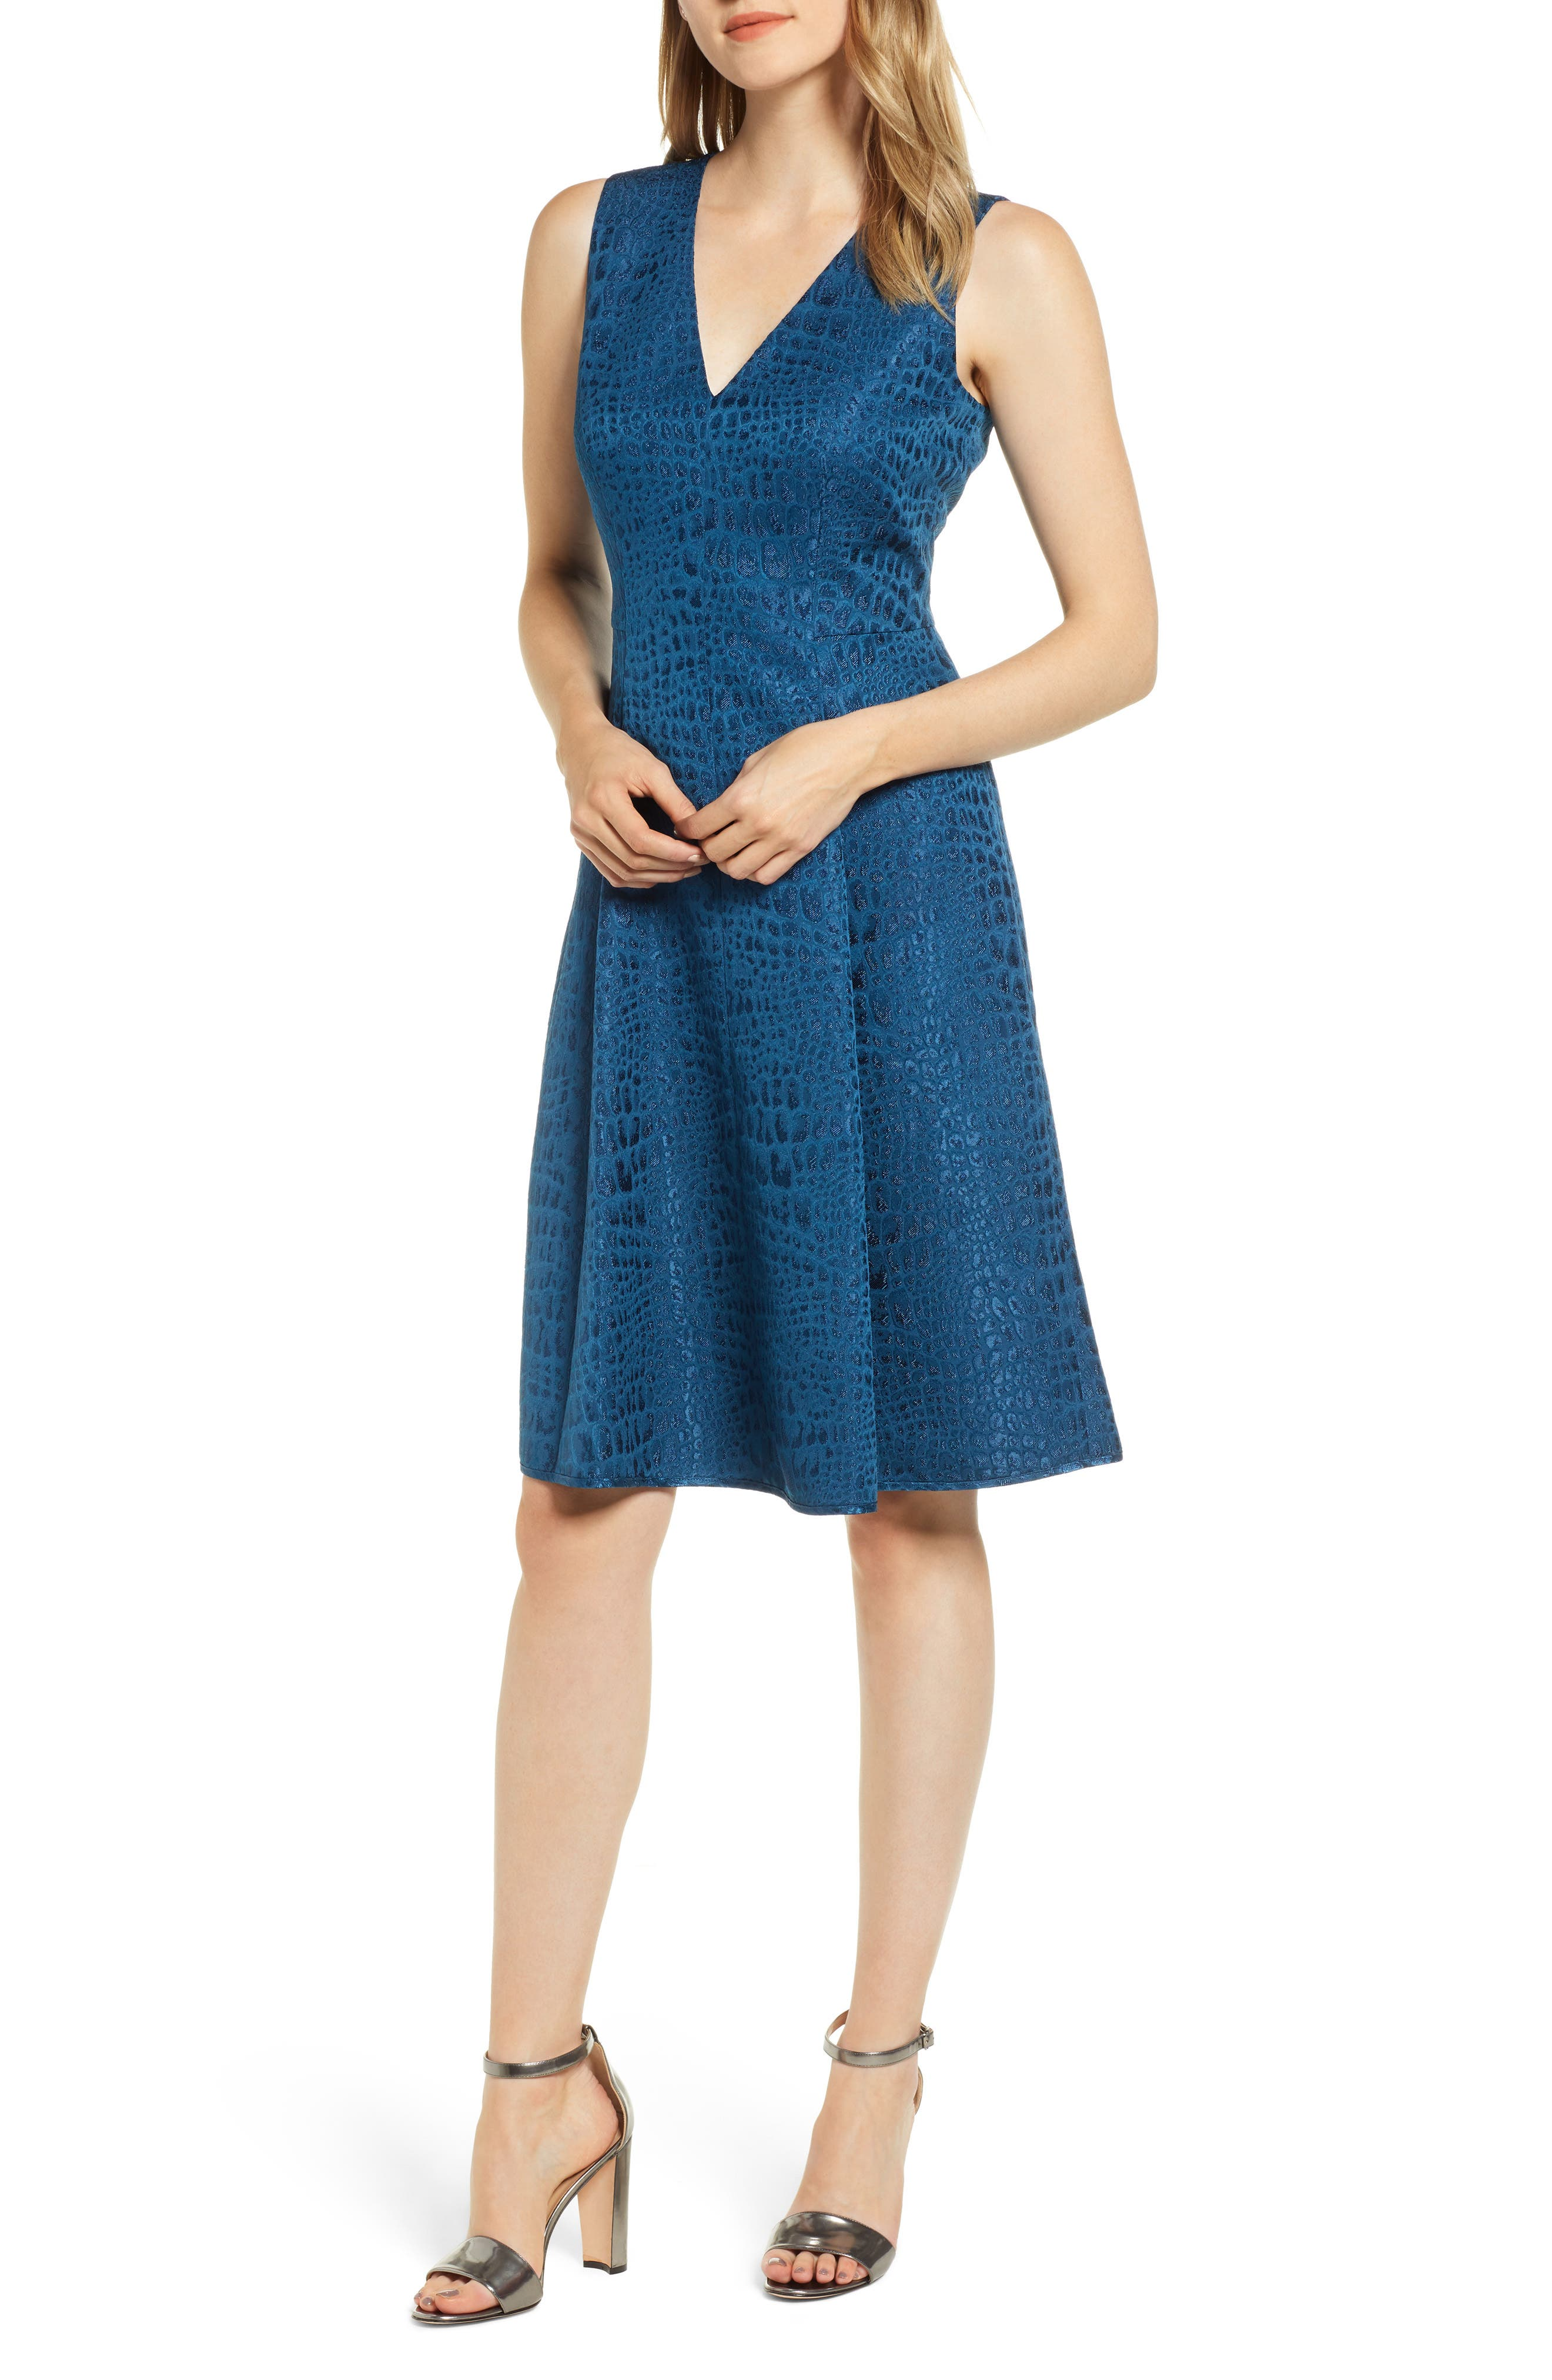 Shrugs for Dresses at Nordstrom's